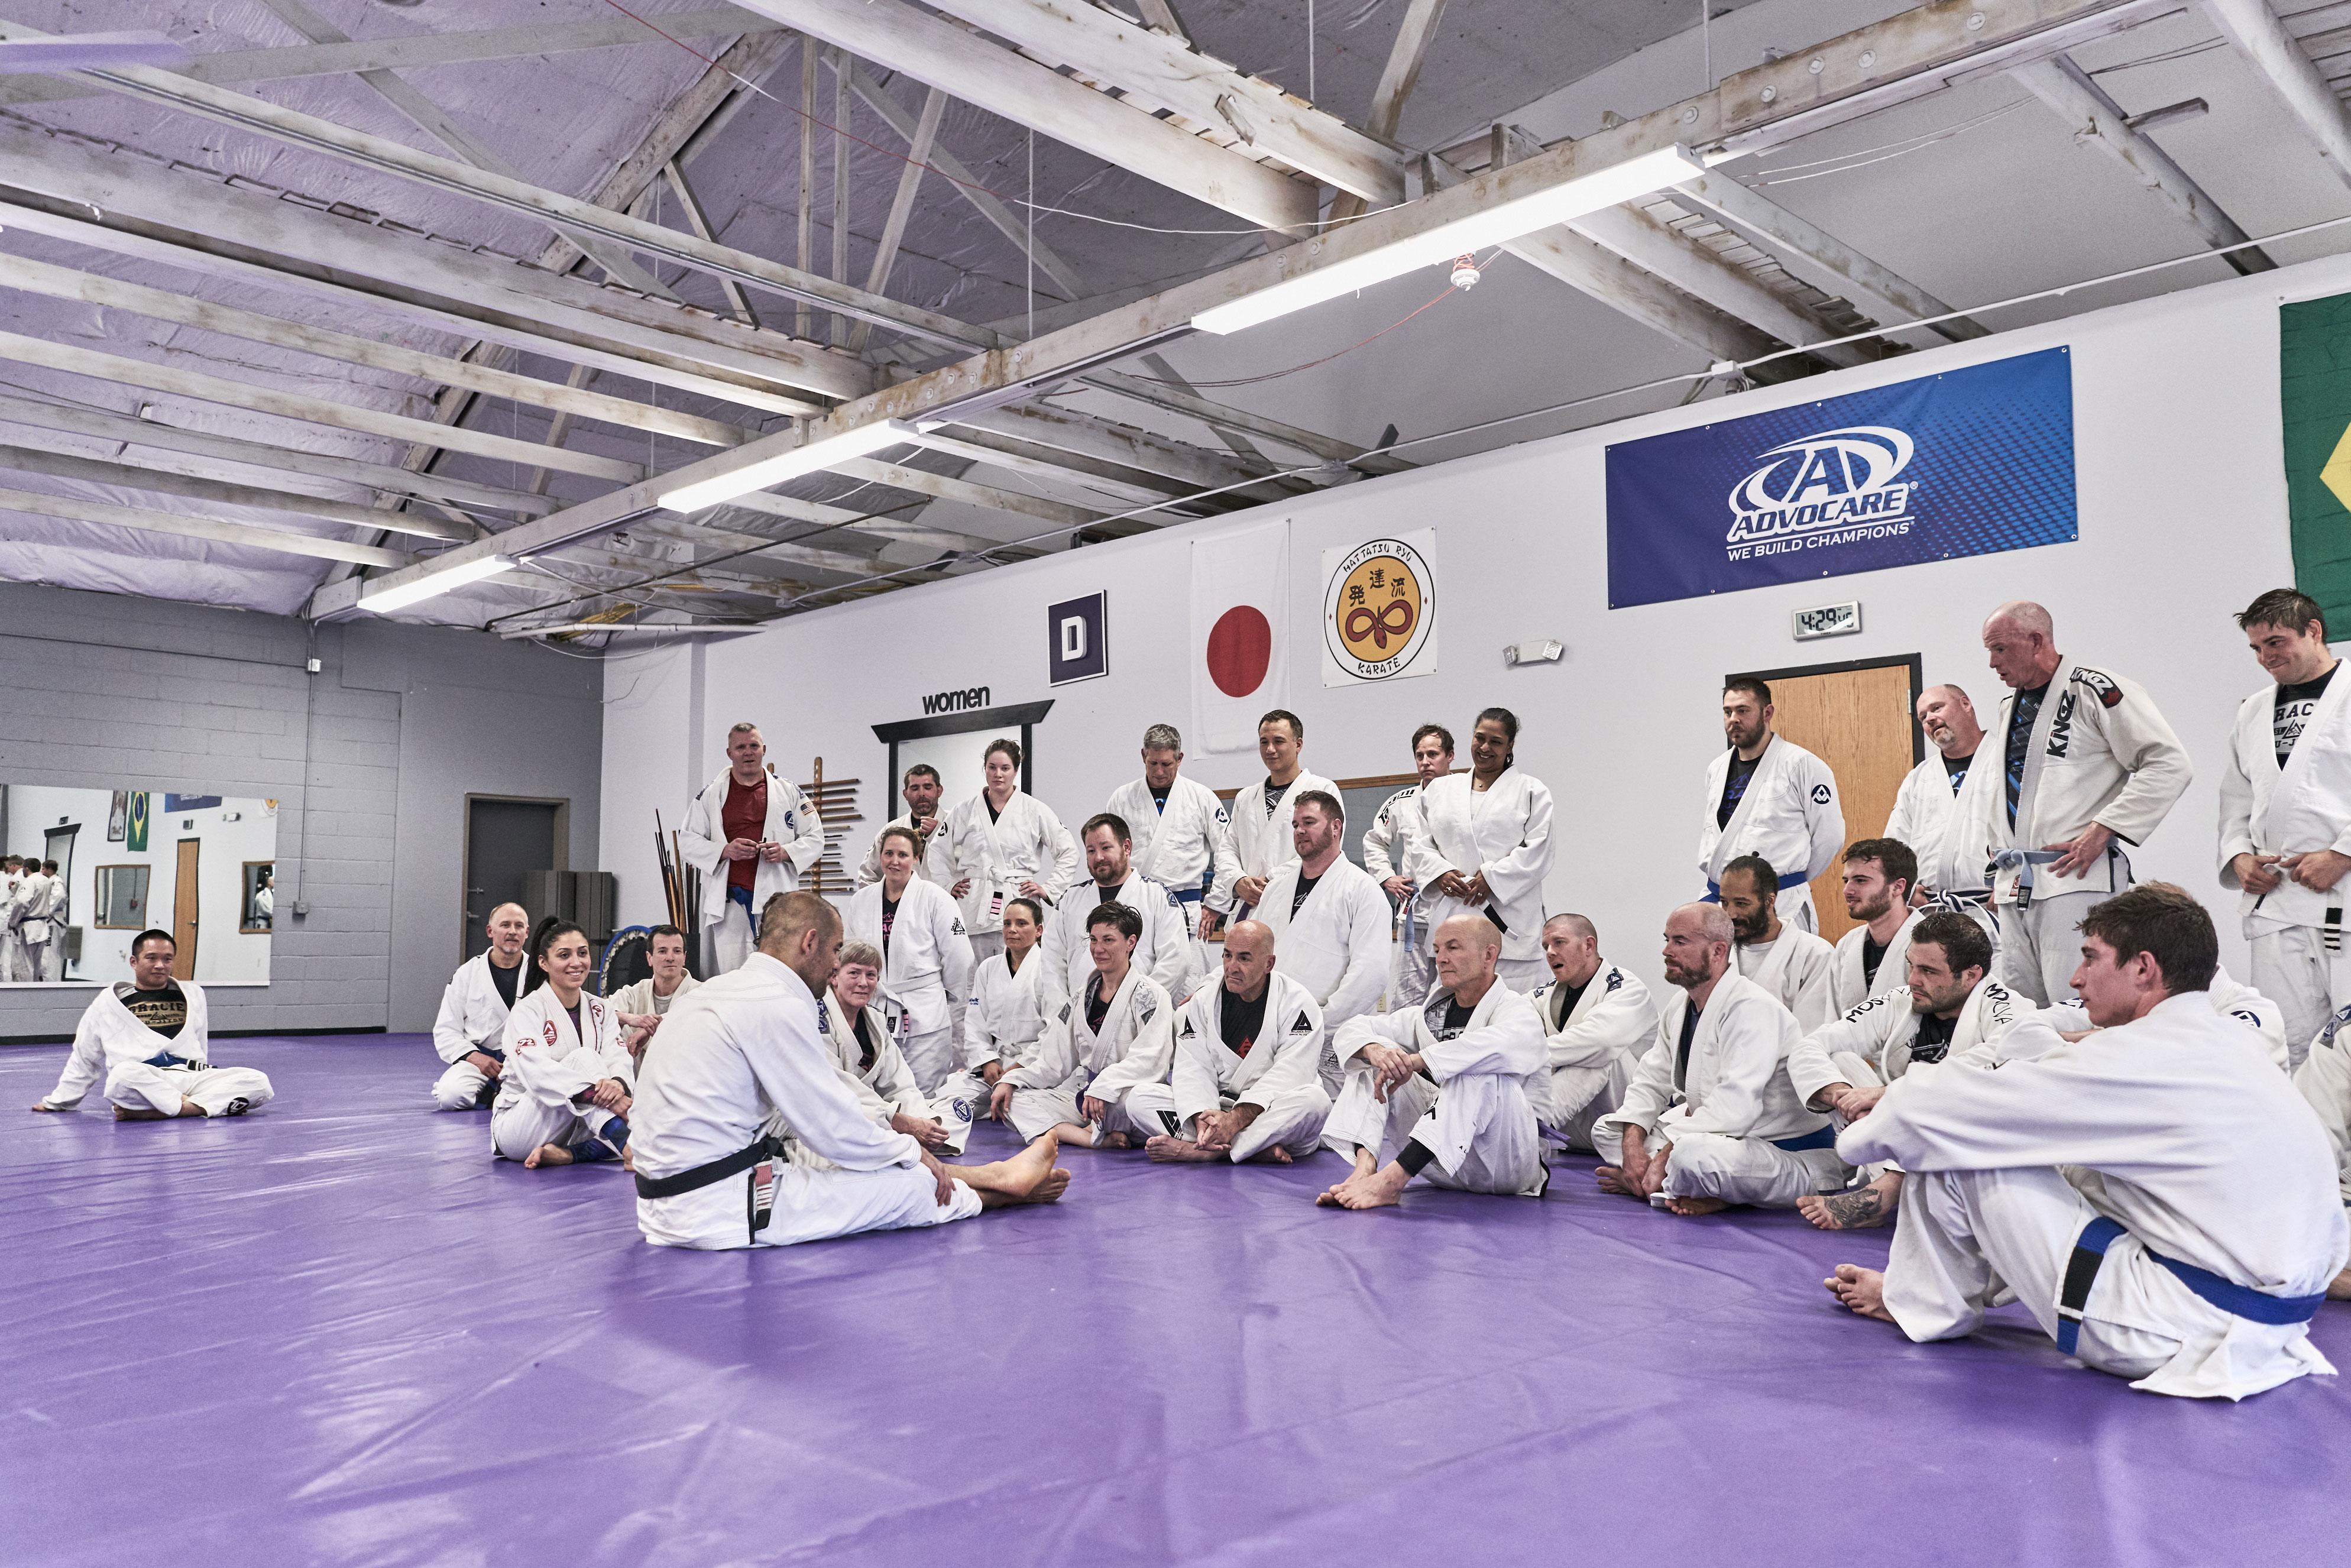 Gracie jui-jitsu students listening to Ryron Gracie during seminar